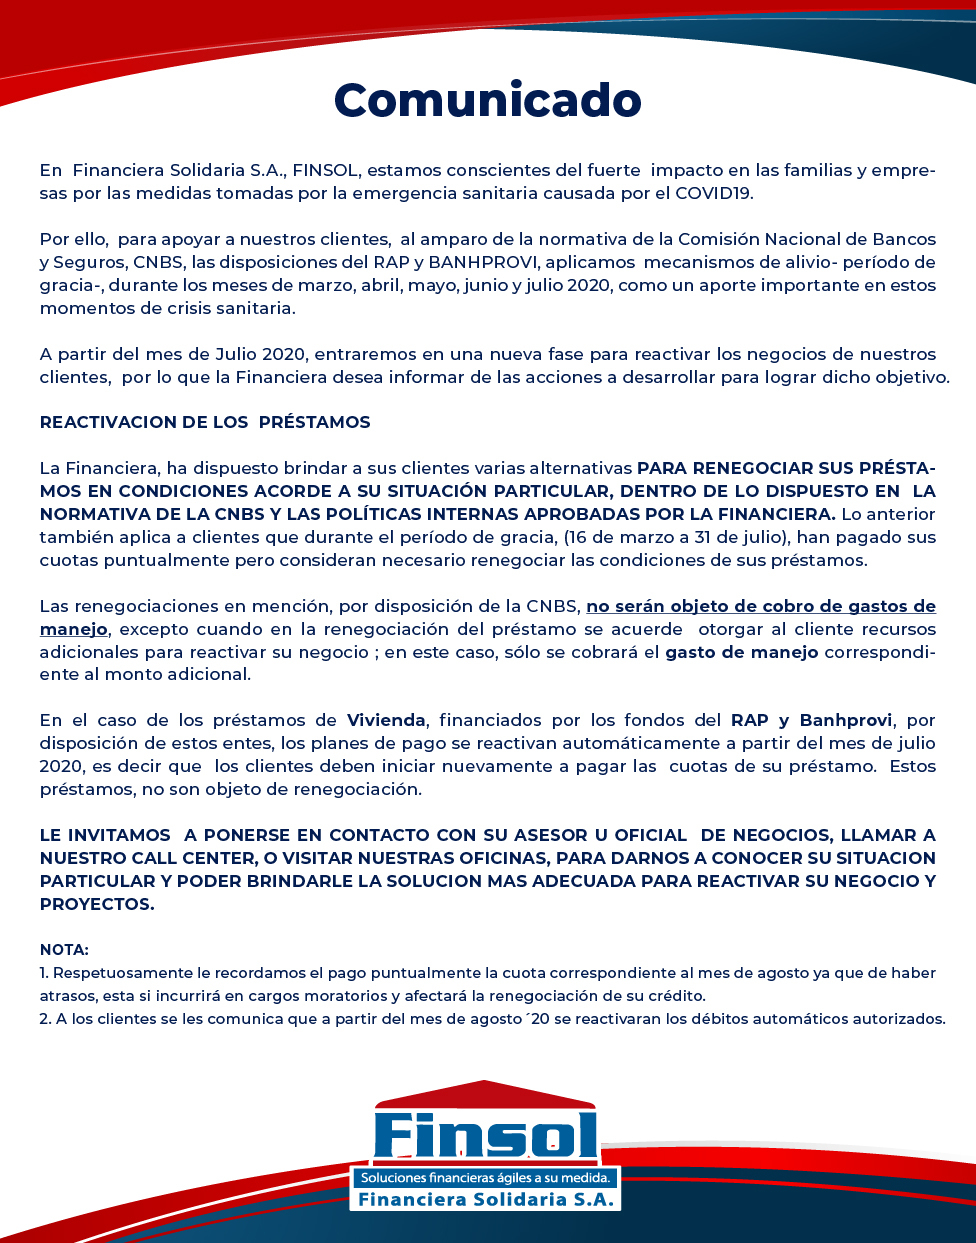 Comunicado Finsol Julio 2020